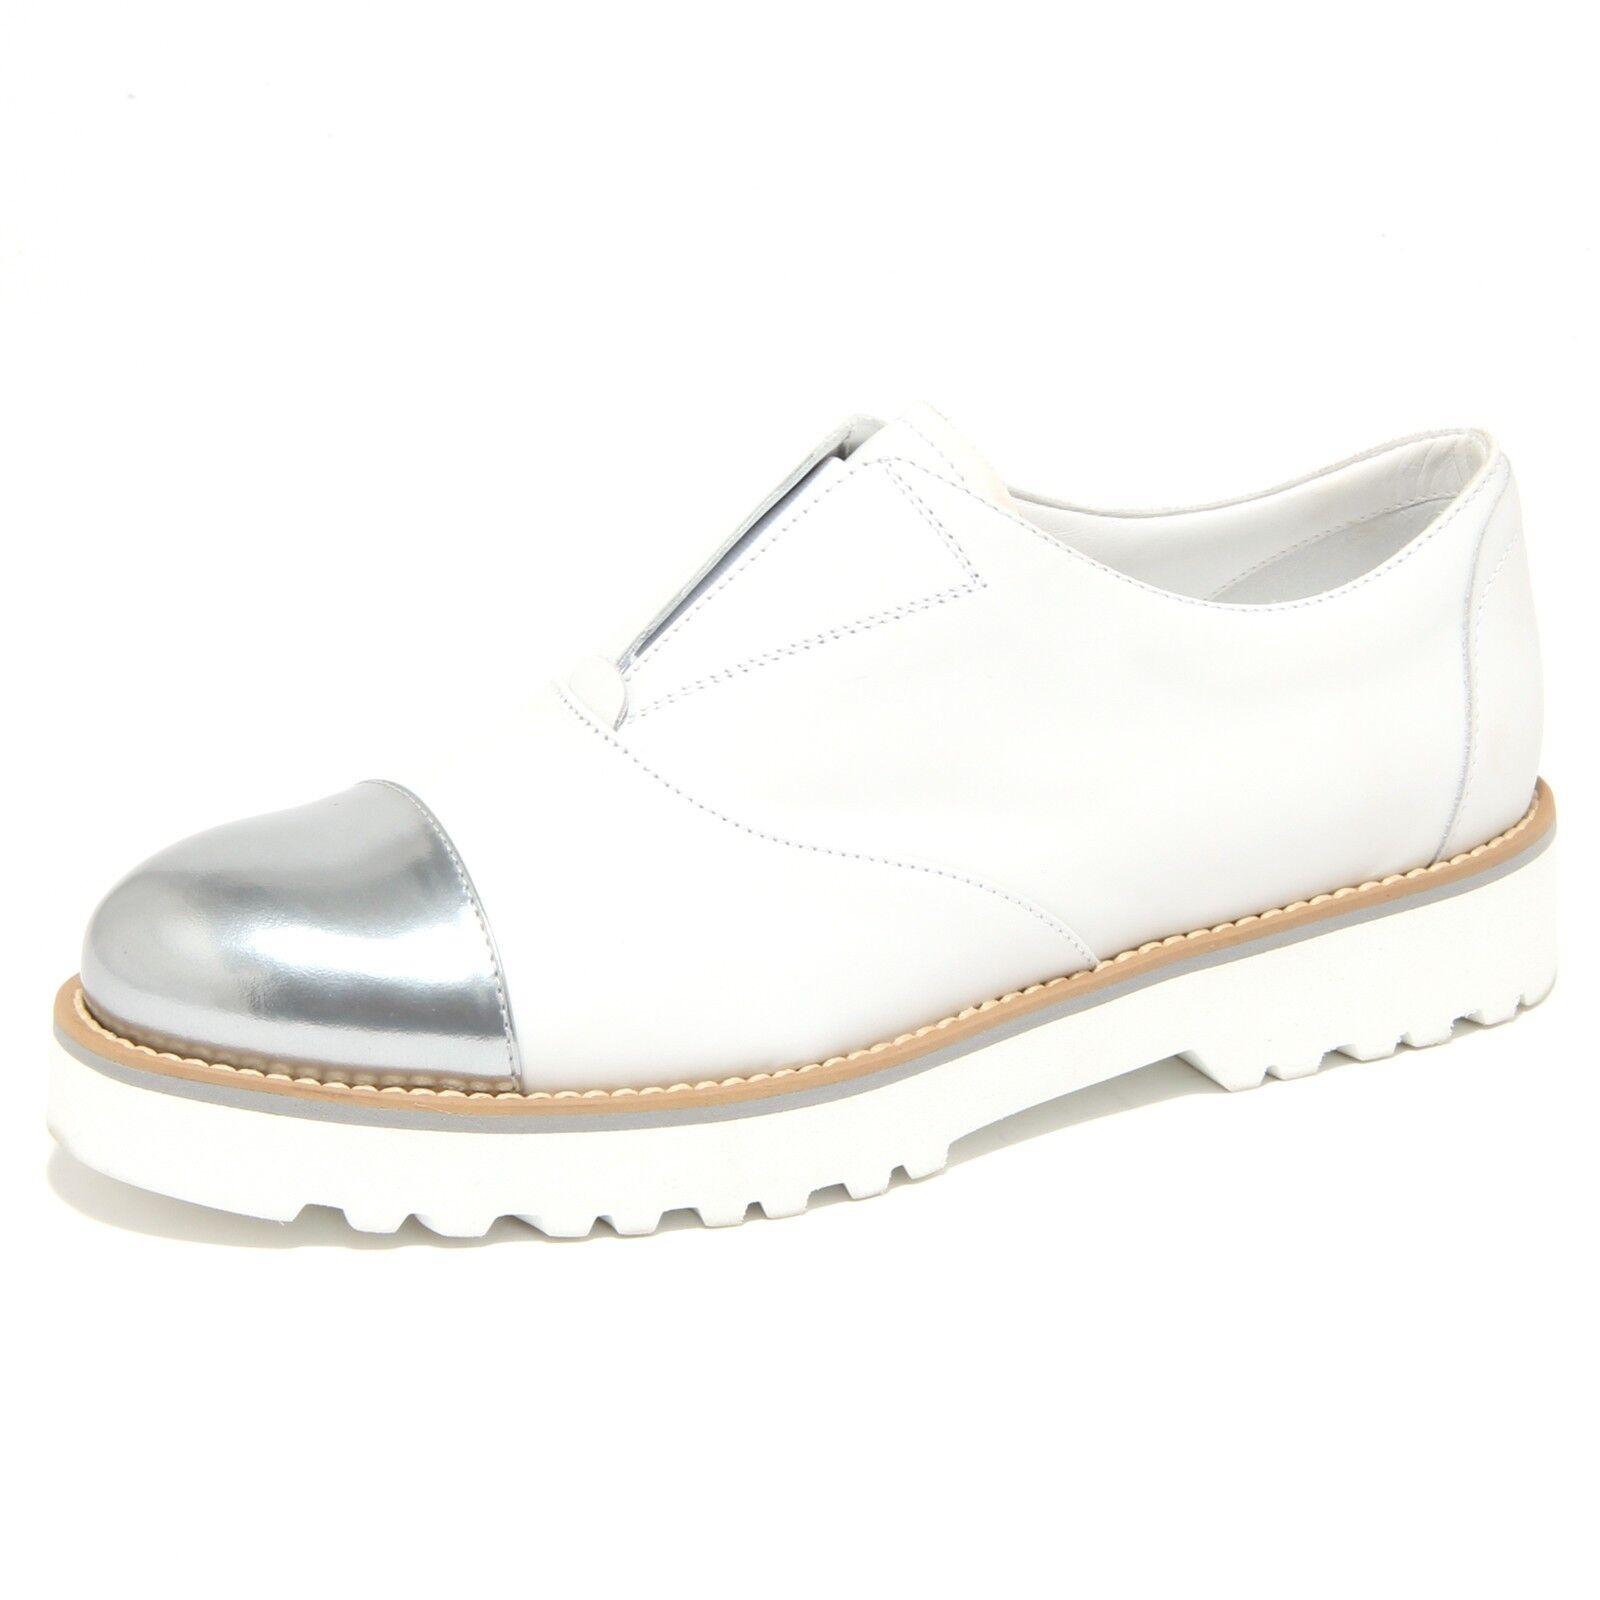 6407N donna sneaker HOGAN ROUTE scarpe donna 6407N slippers shoes women 84e87d